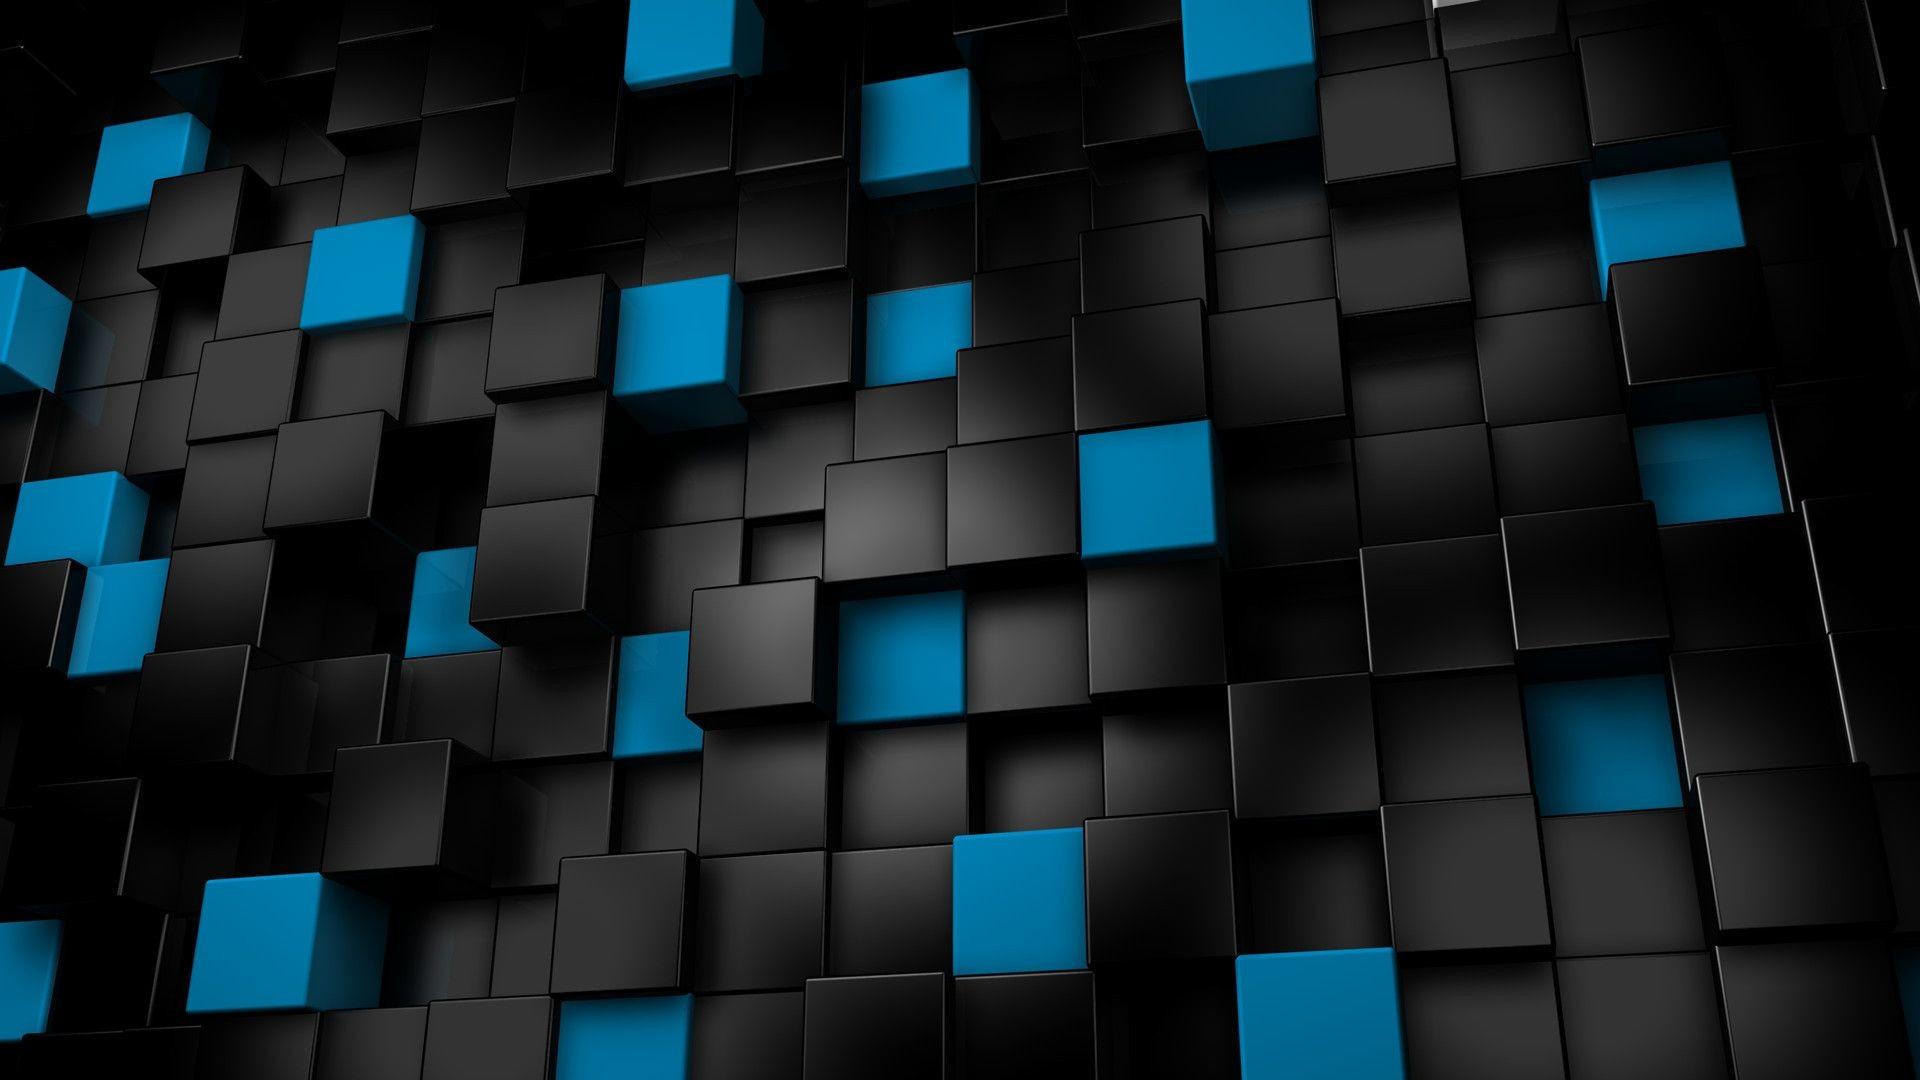 Res: 1920x1080, Cool Wallpaper Live 3d Abstract Wallpaper 2018 Wallpapers Hd Of Cool  Wallpaper Live Slytherin iPhone 7